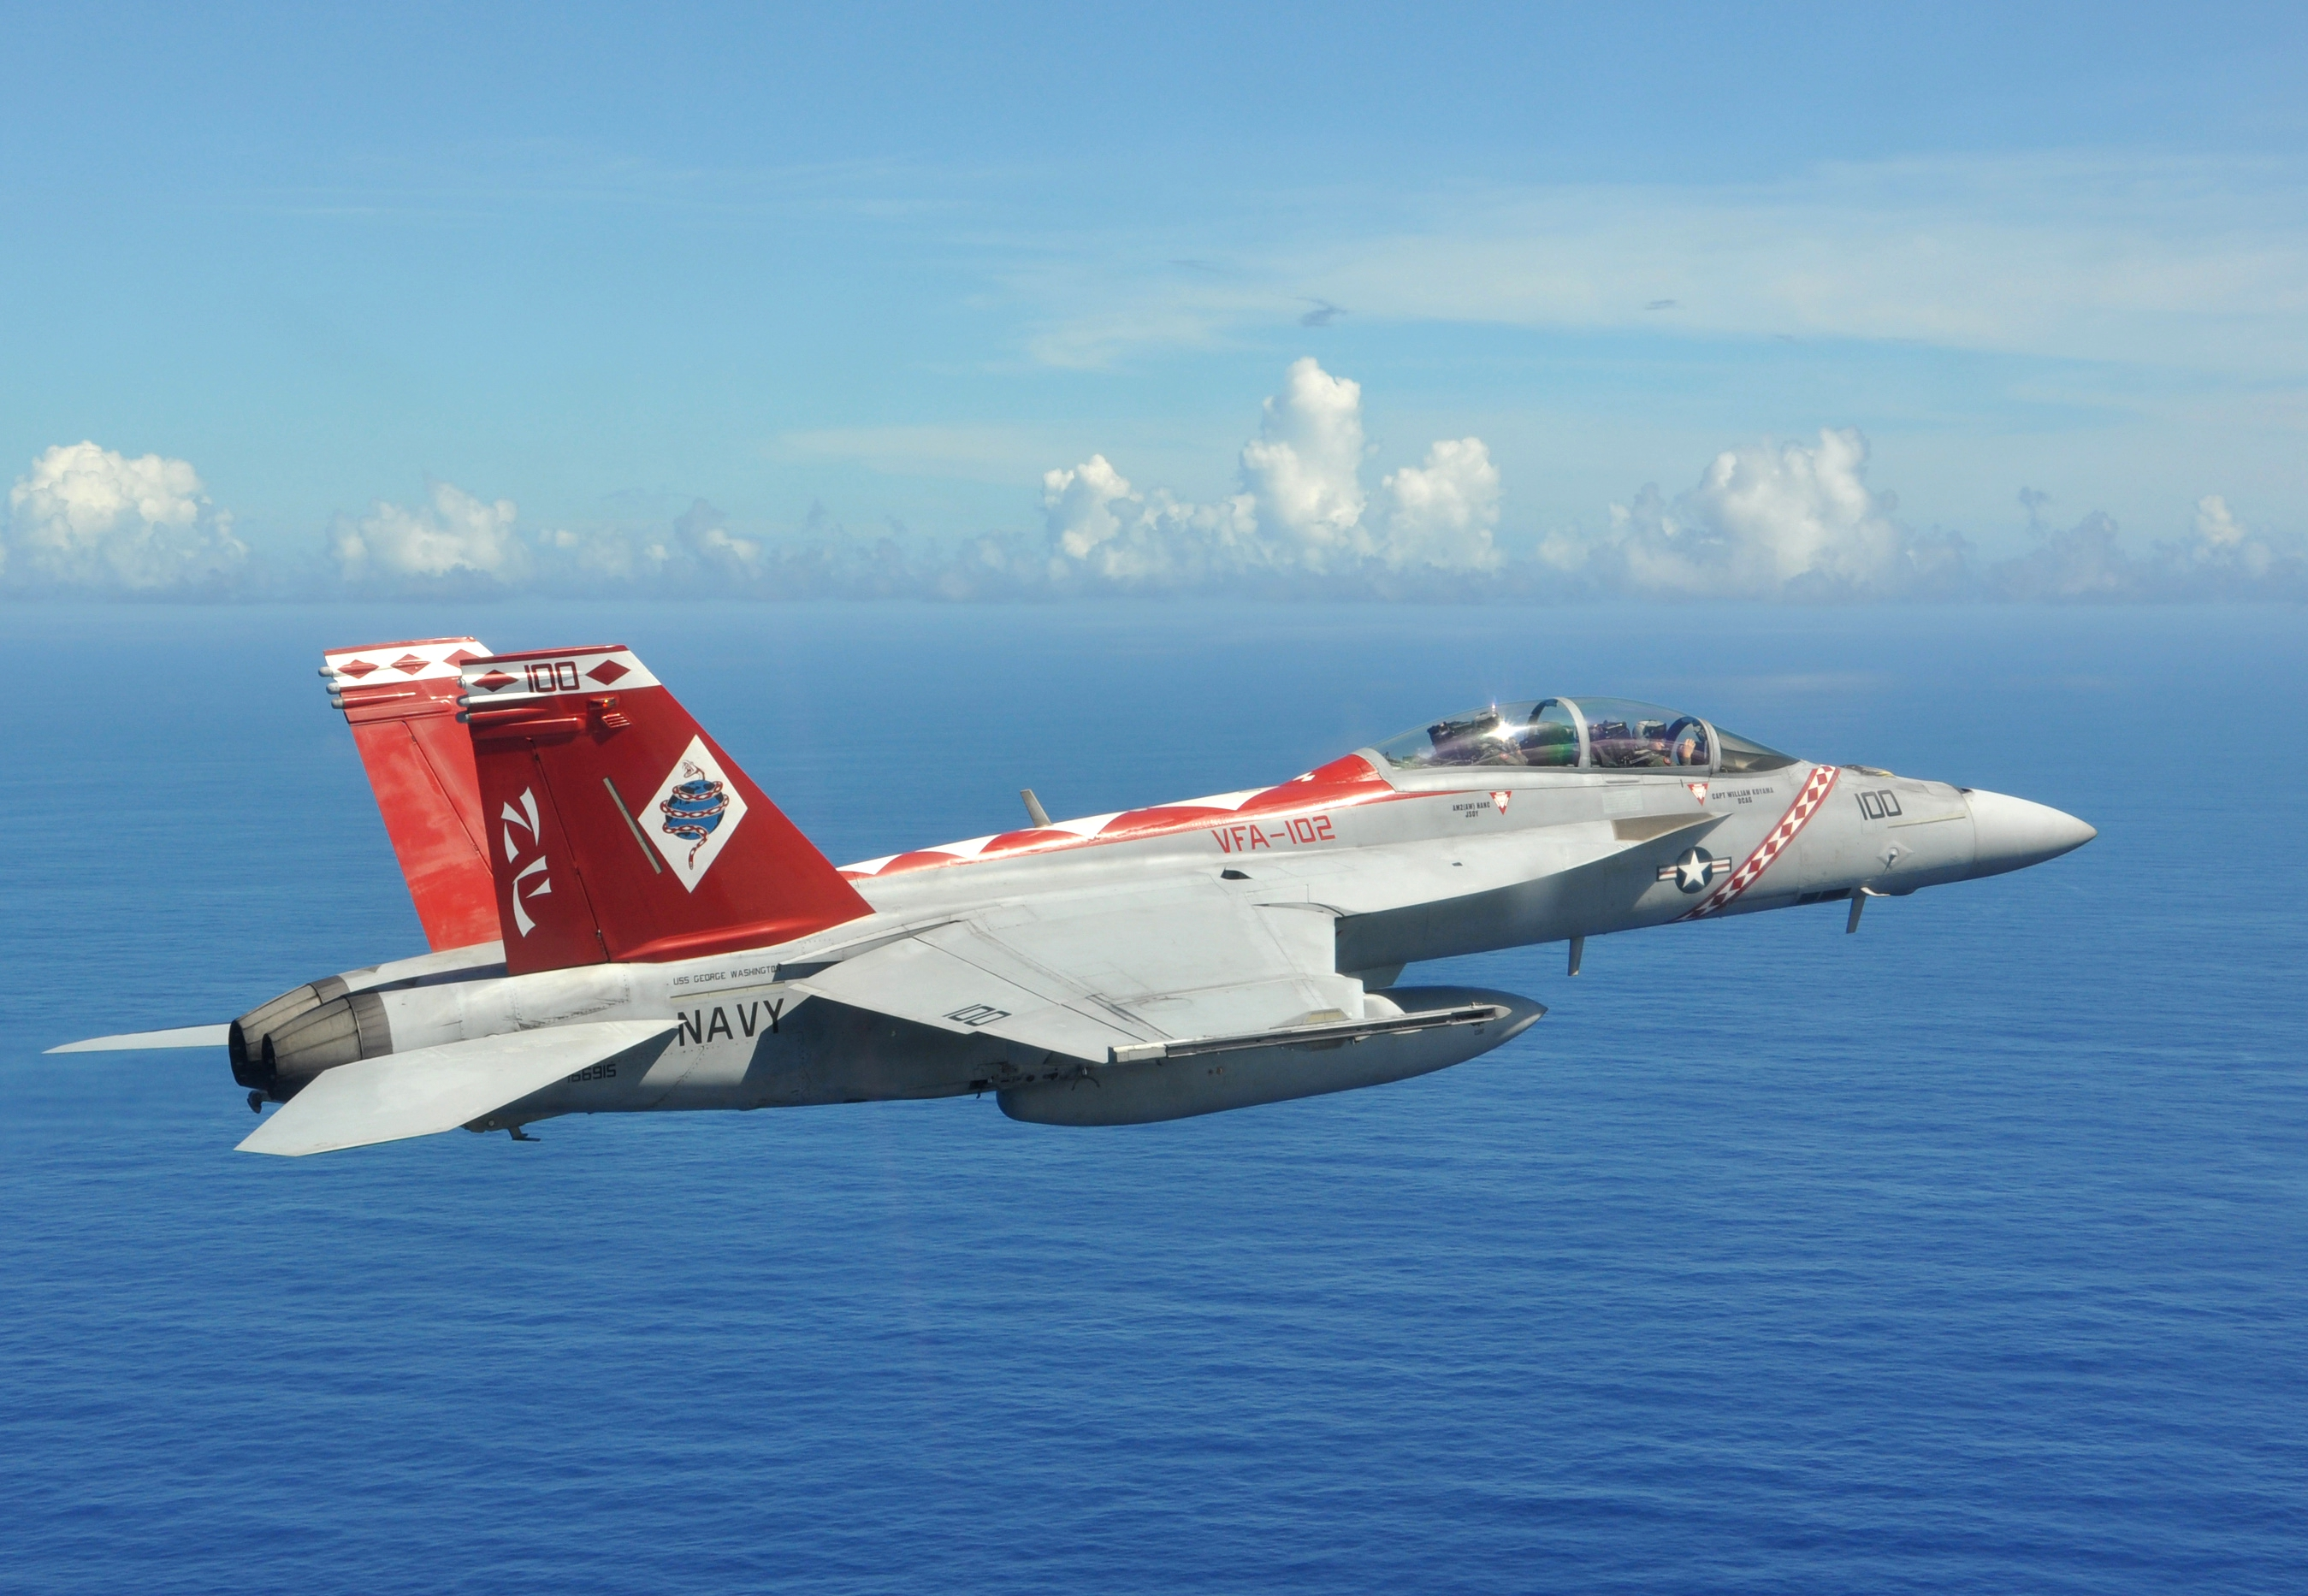 NAVAL AIR STATION NAS OCEANA VIRGINIA US NAVY PATCH USS MASTER JET BASE F14 F18